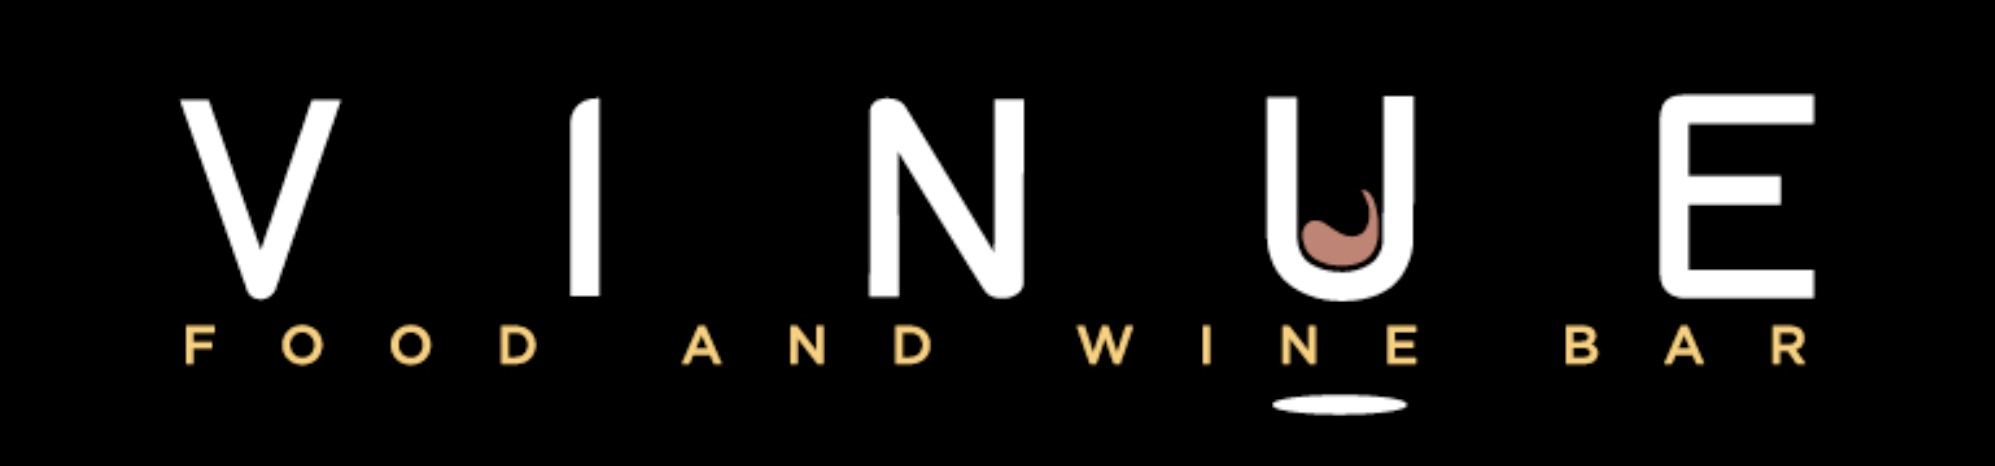 vinue+logo.jpg